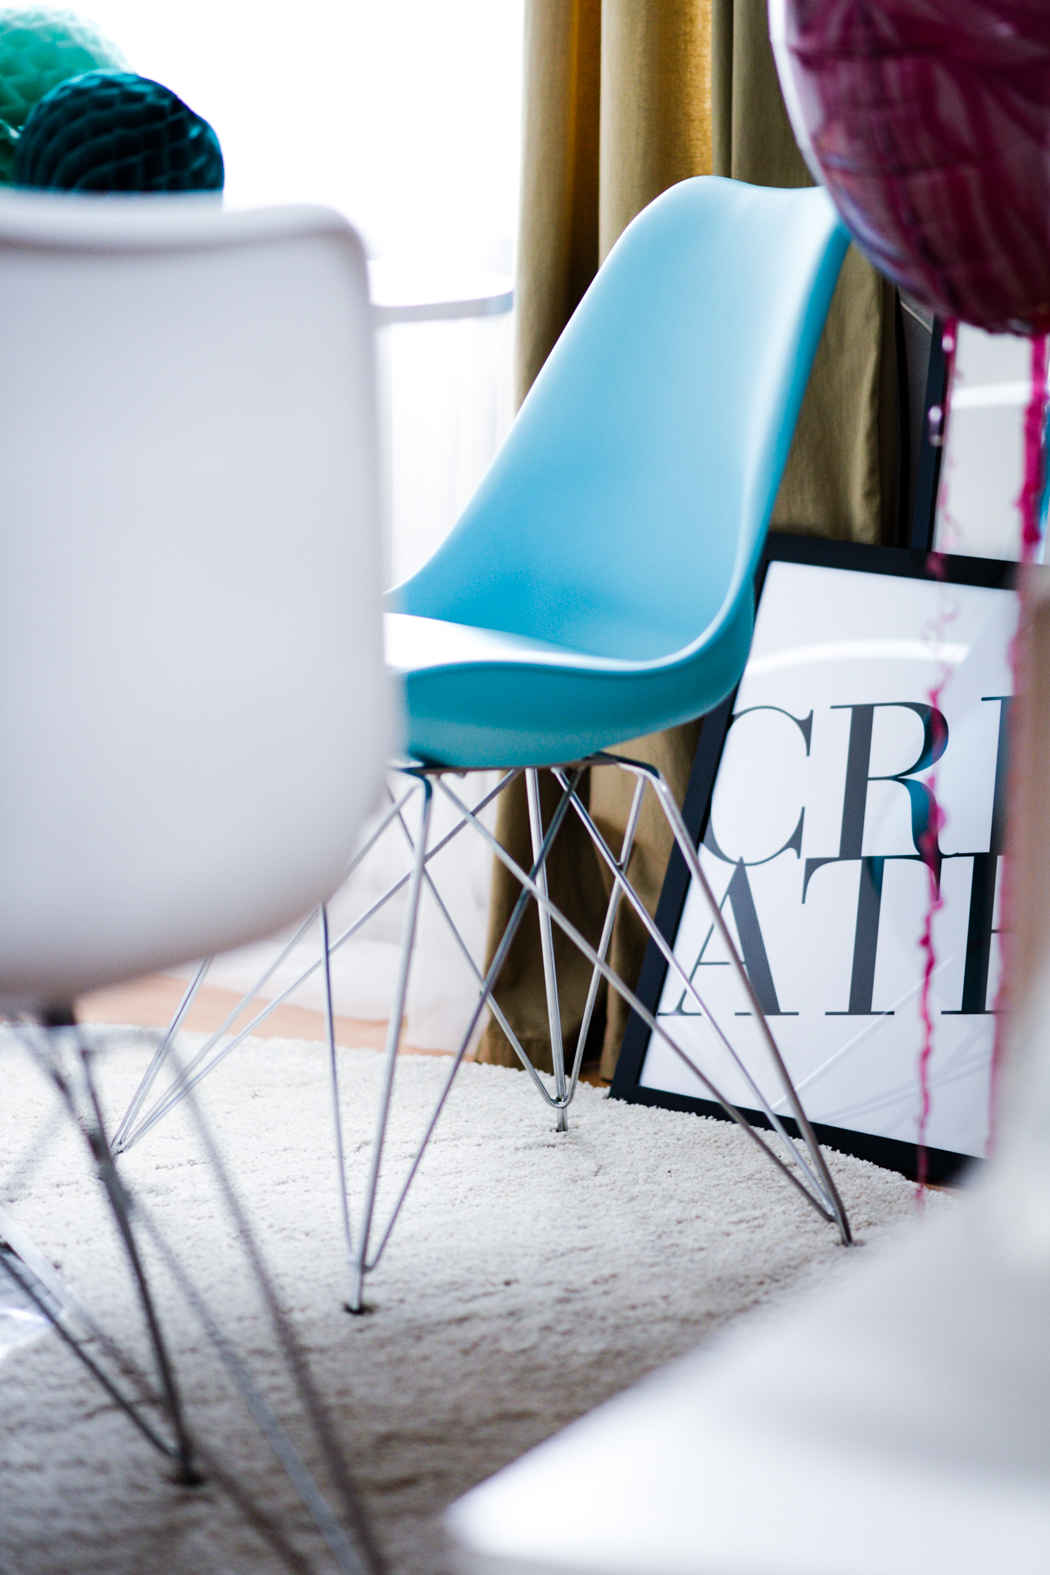 interieur new dining room lindarella fashion und fitness blog aus m nchen. Black Bedroom Furniture Sets. Home Design Ideas